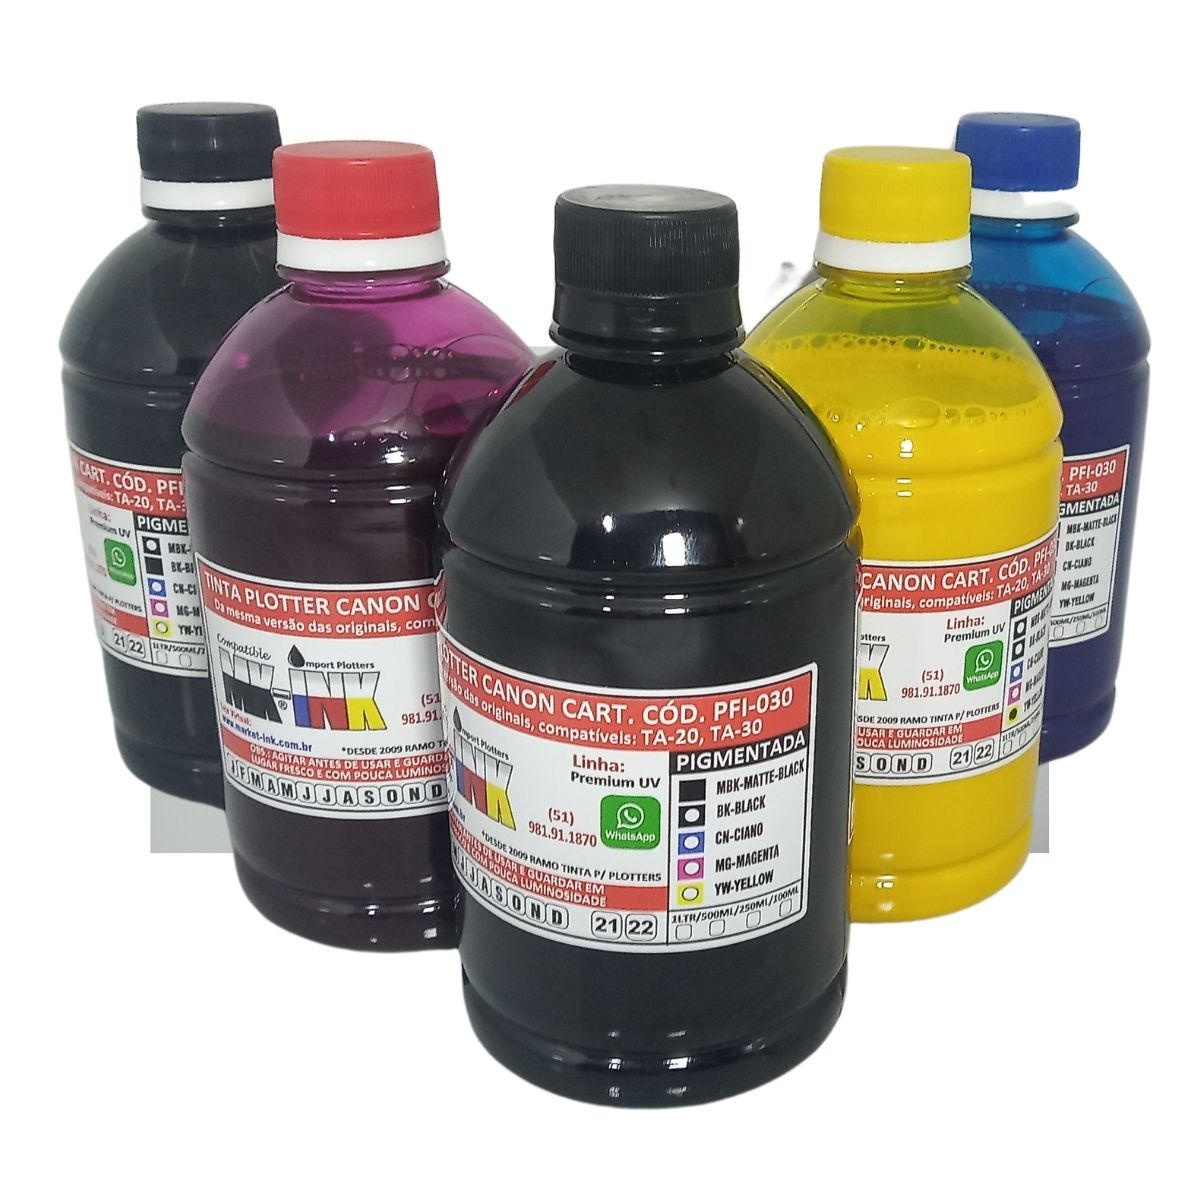 Jogo 5x100ml Tintas Premium Pigmentada Plotters Canon Ta-20 Ta-30 que utilizam cartuchos códigos PFI-030